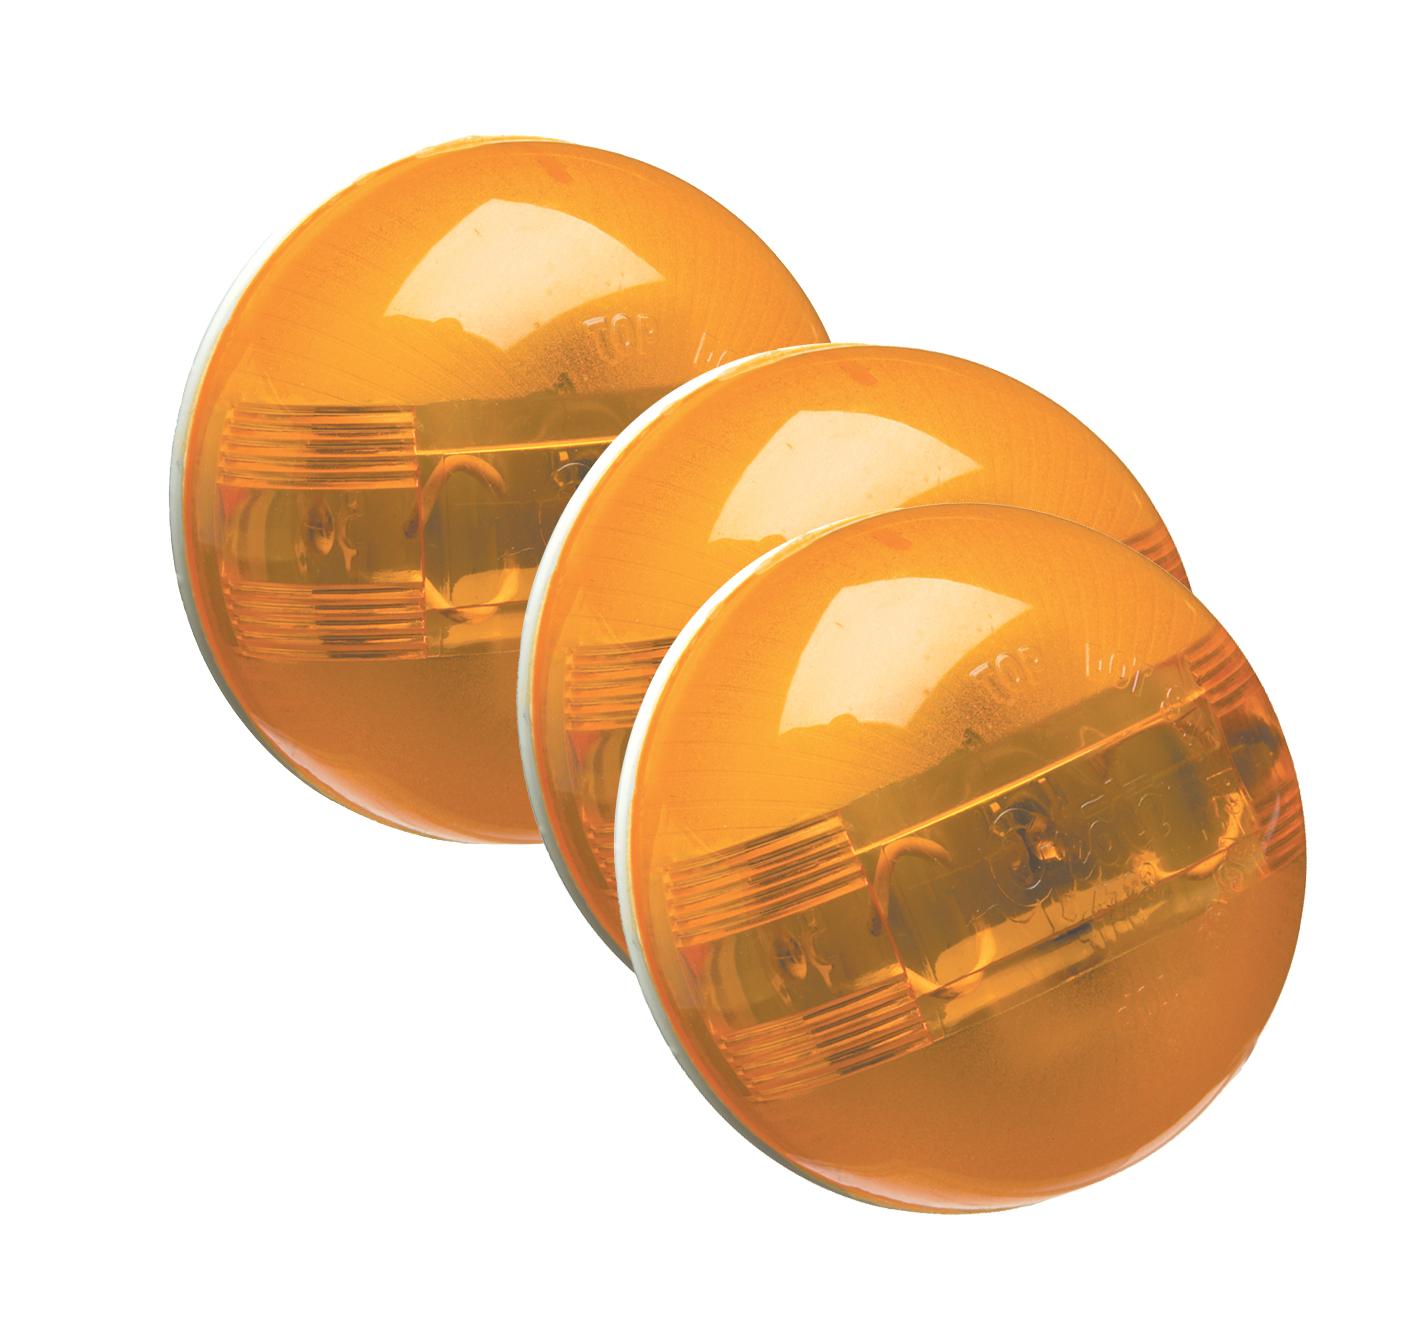 47233-3 – SuperNova® 2 1/2″ PC Rated, LED Clearance Marker Light, Yellow, Bulk Pack